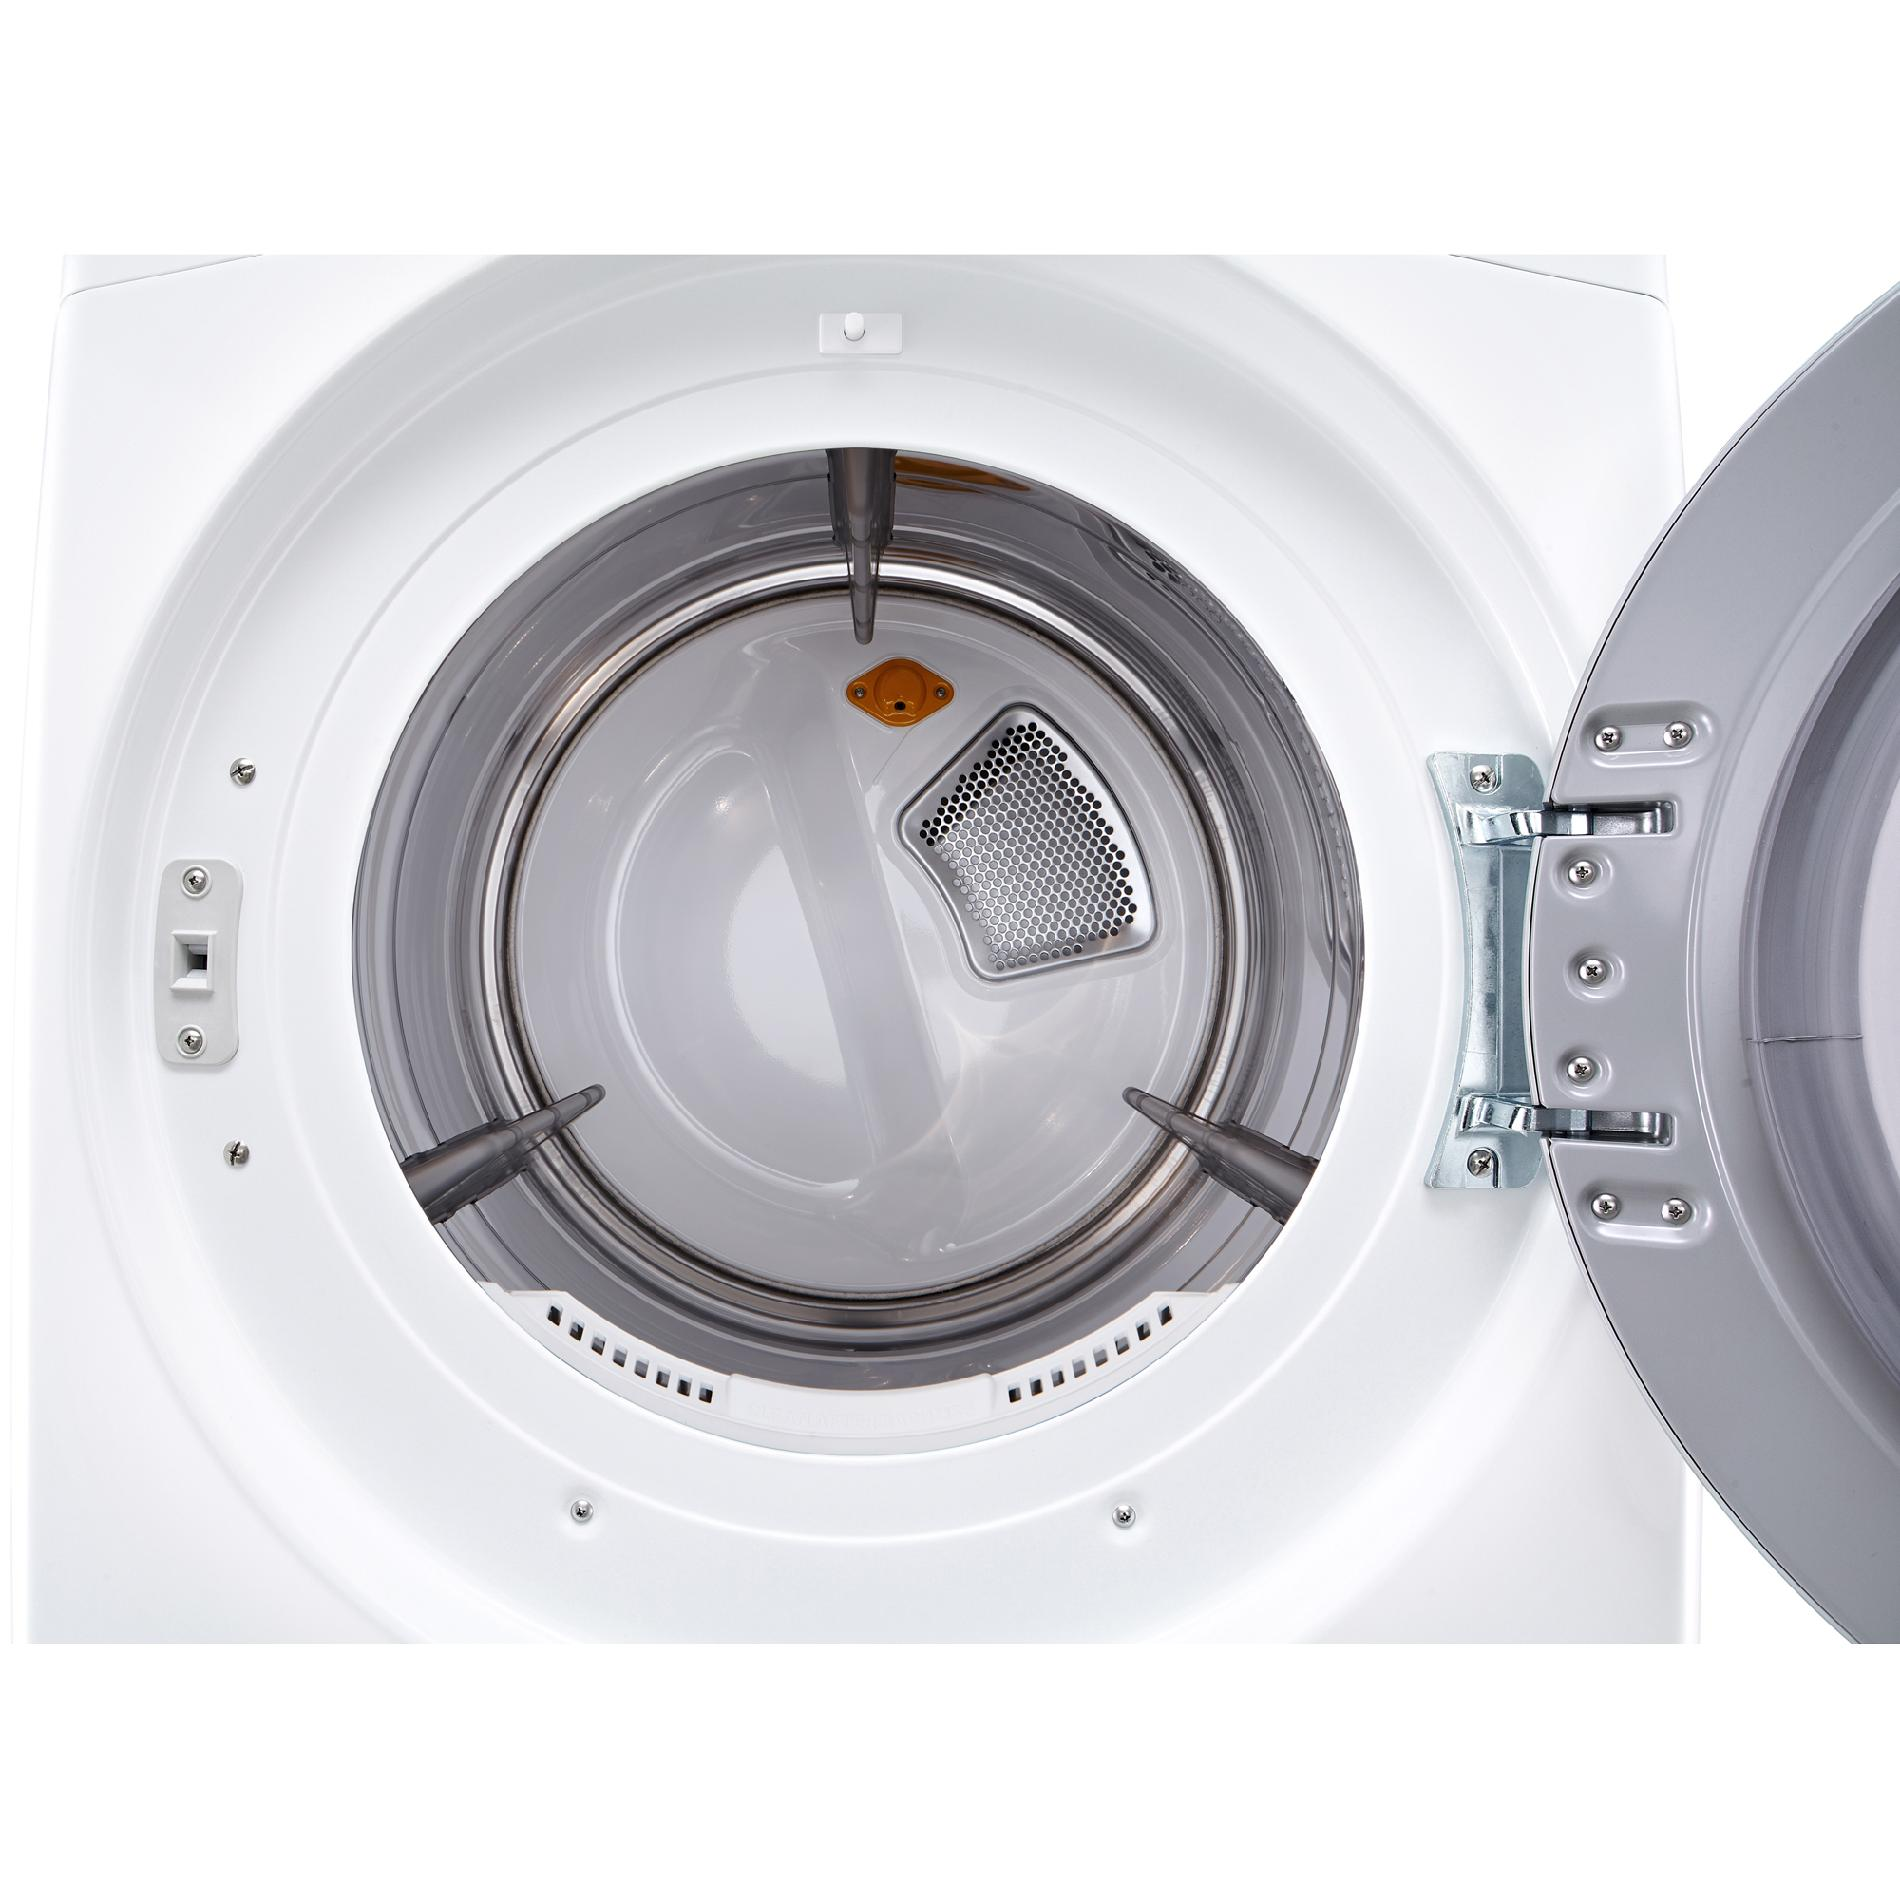 LG DLGX3571W 7.4 cu.ft. Ultra Large Capacity Gas SteamDryer™ - White